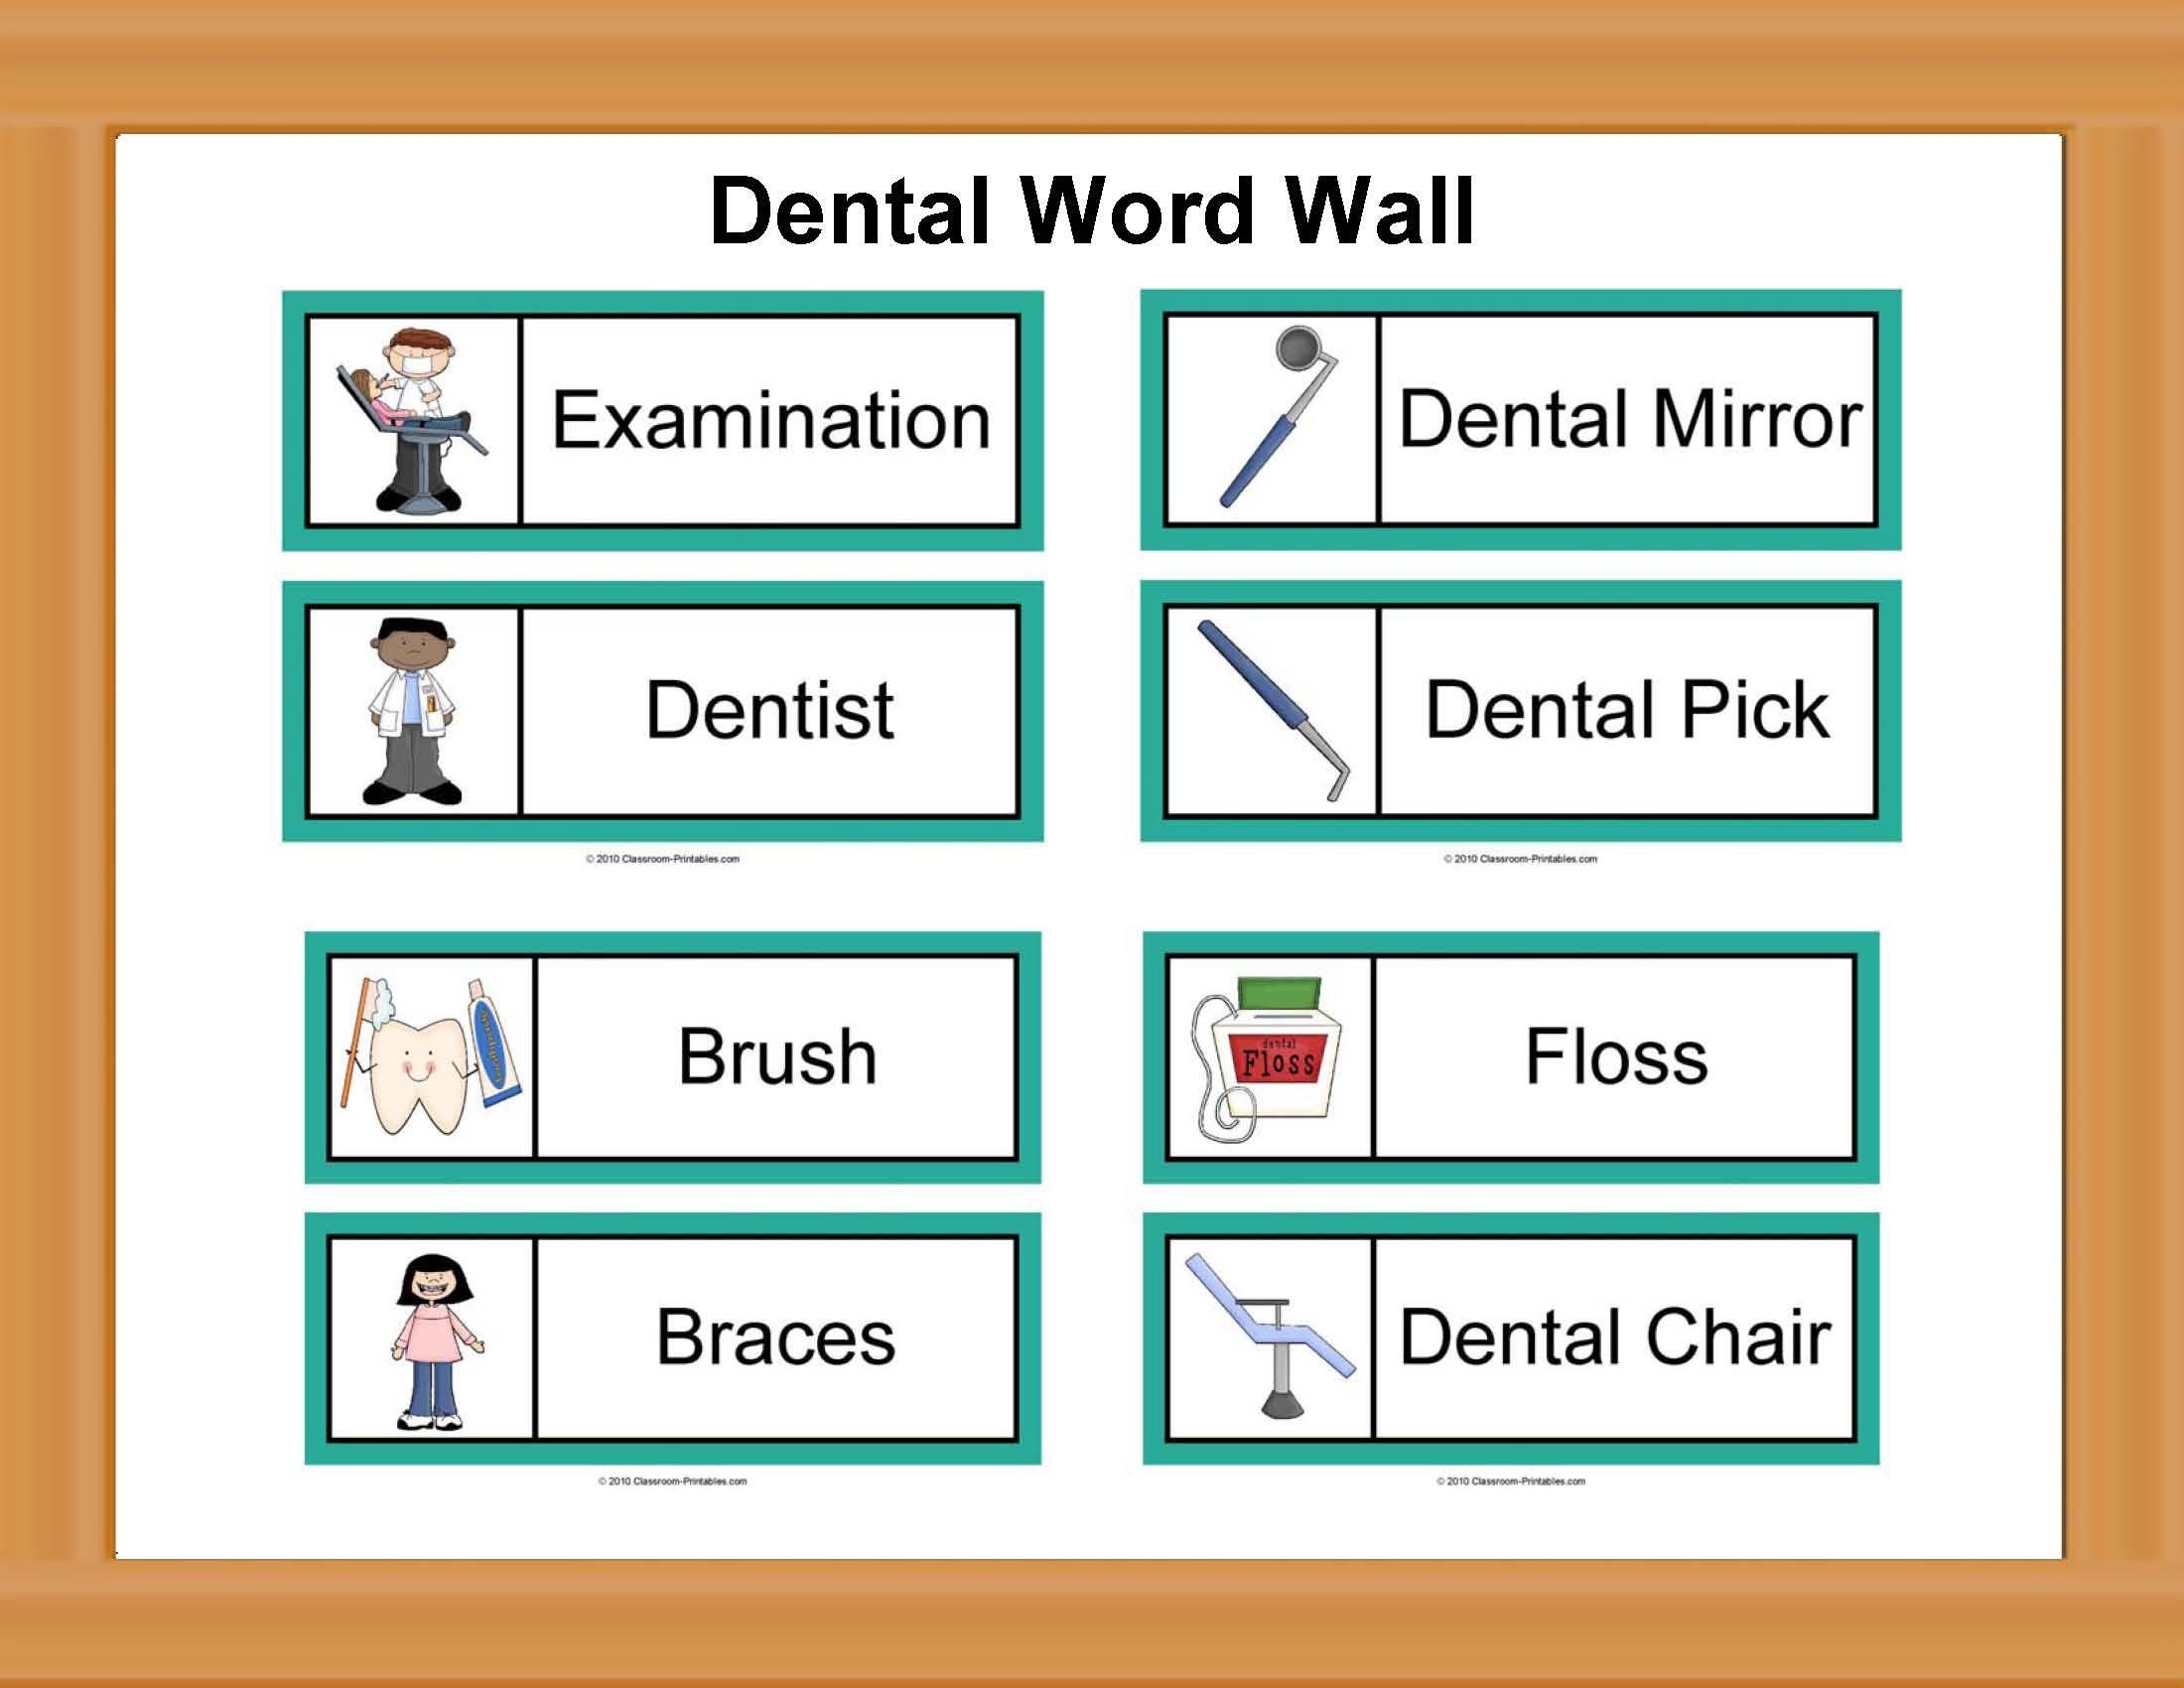 Dental Word Wall